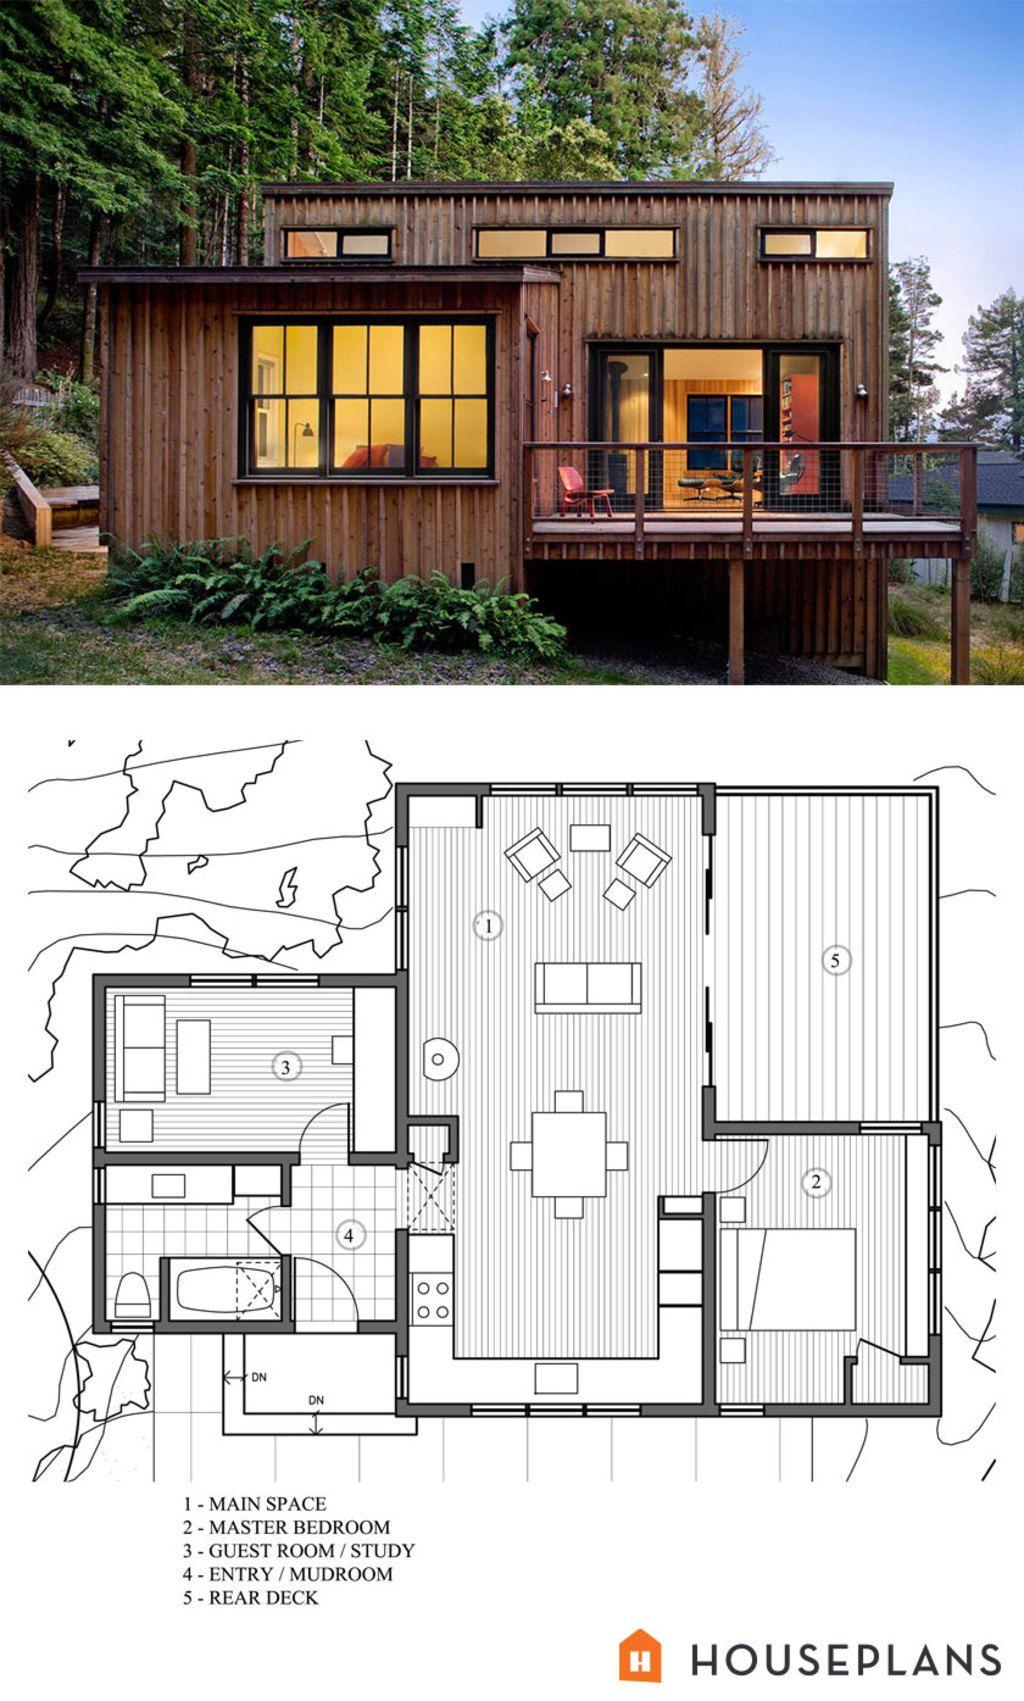 modern style house plan 2 beds 1 baths 840 sqft plan 891